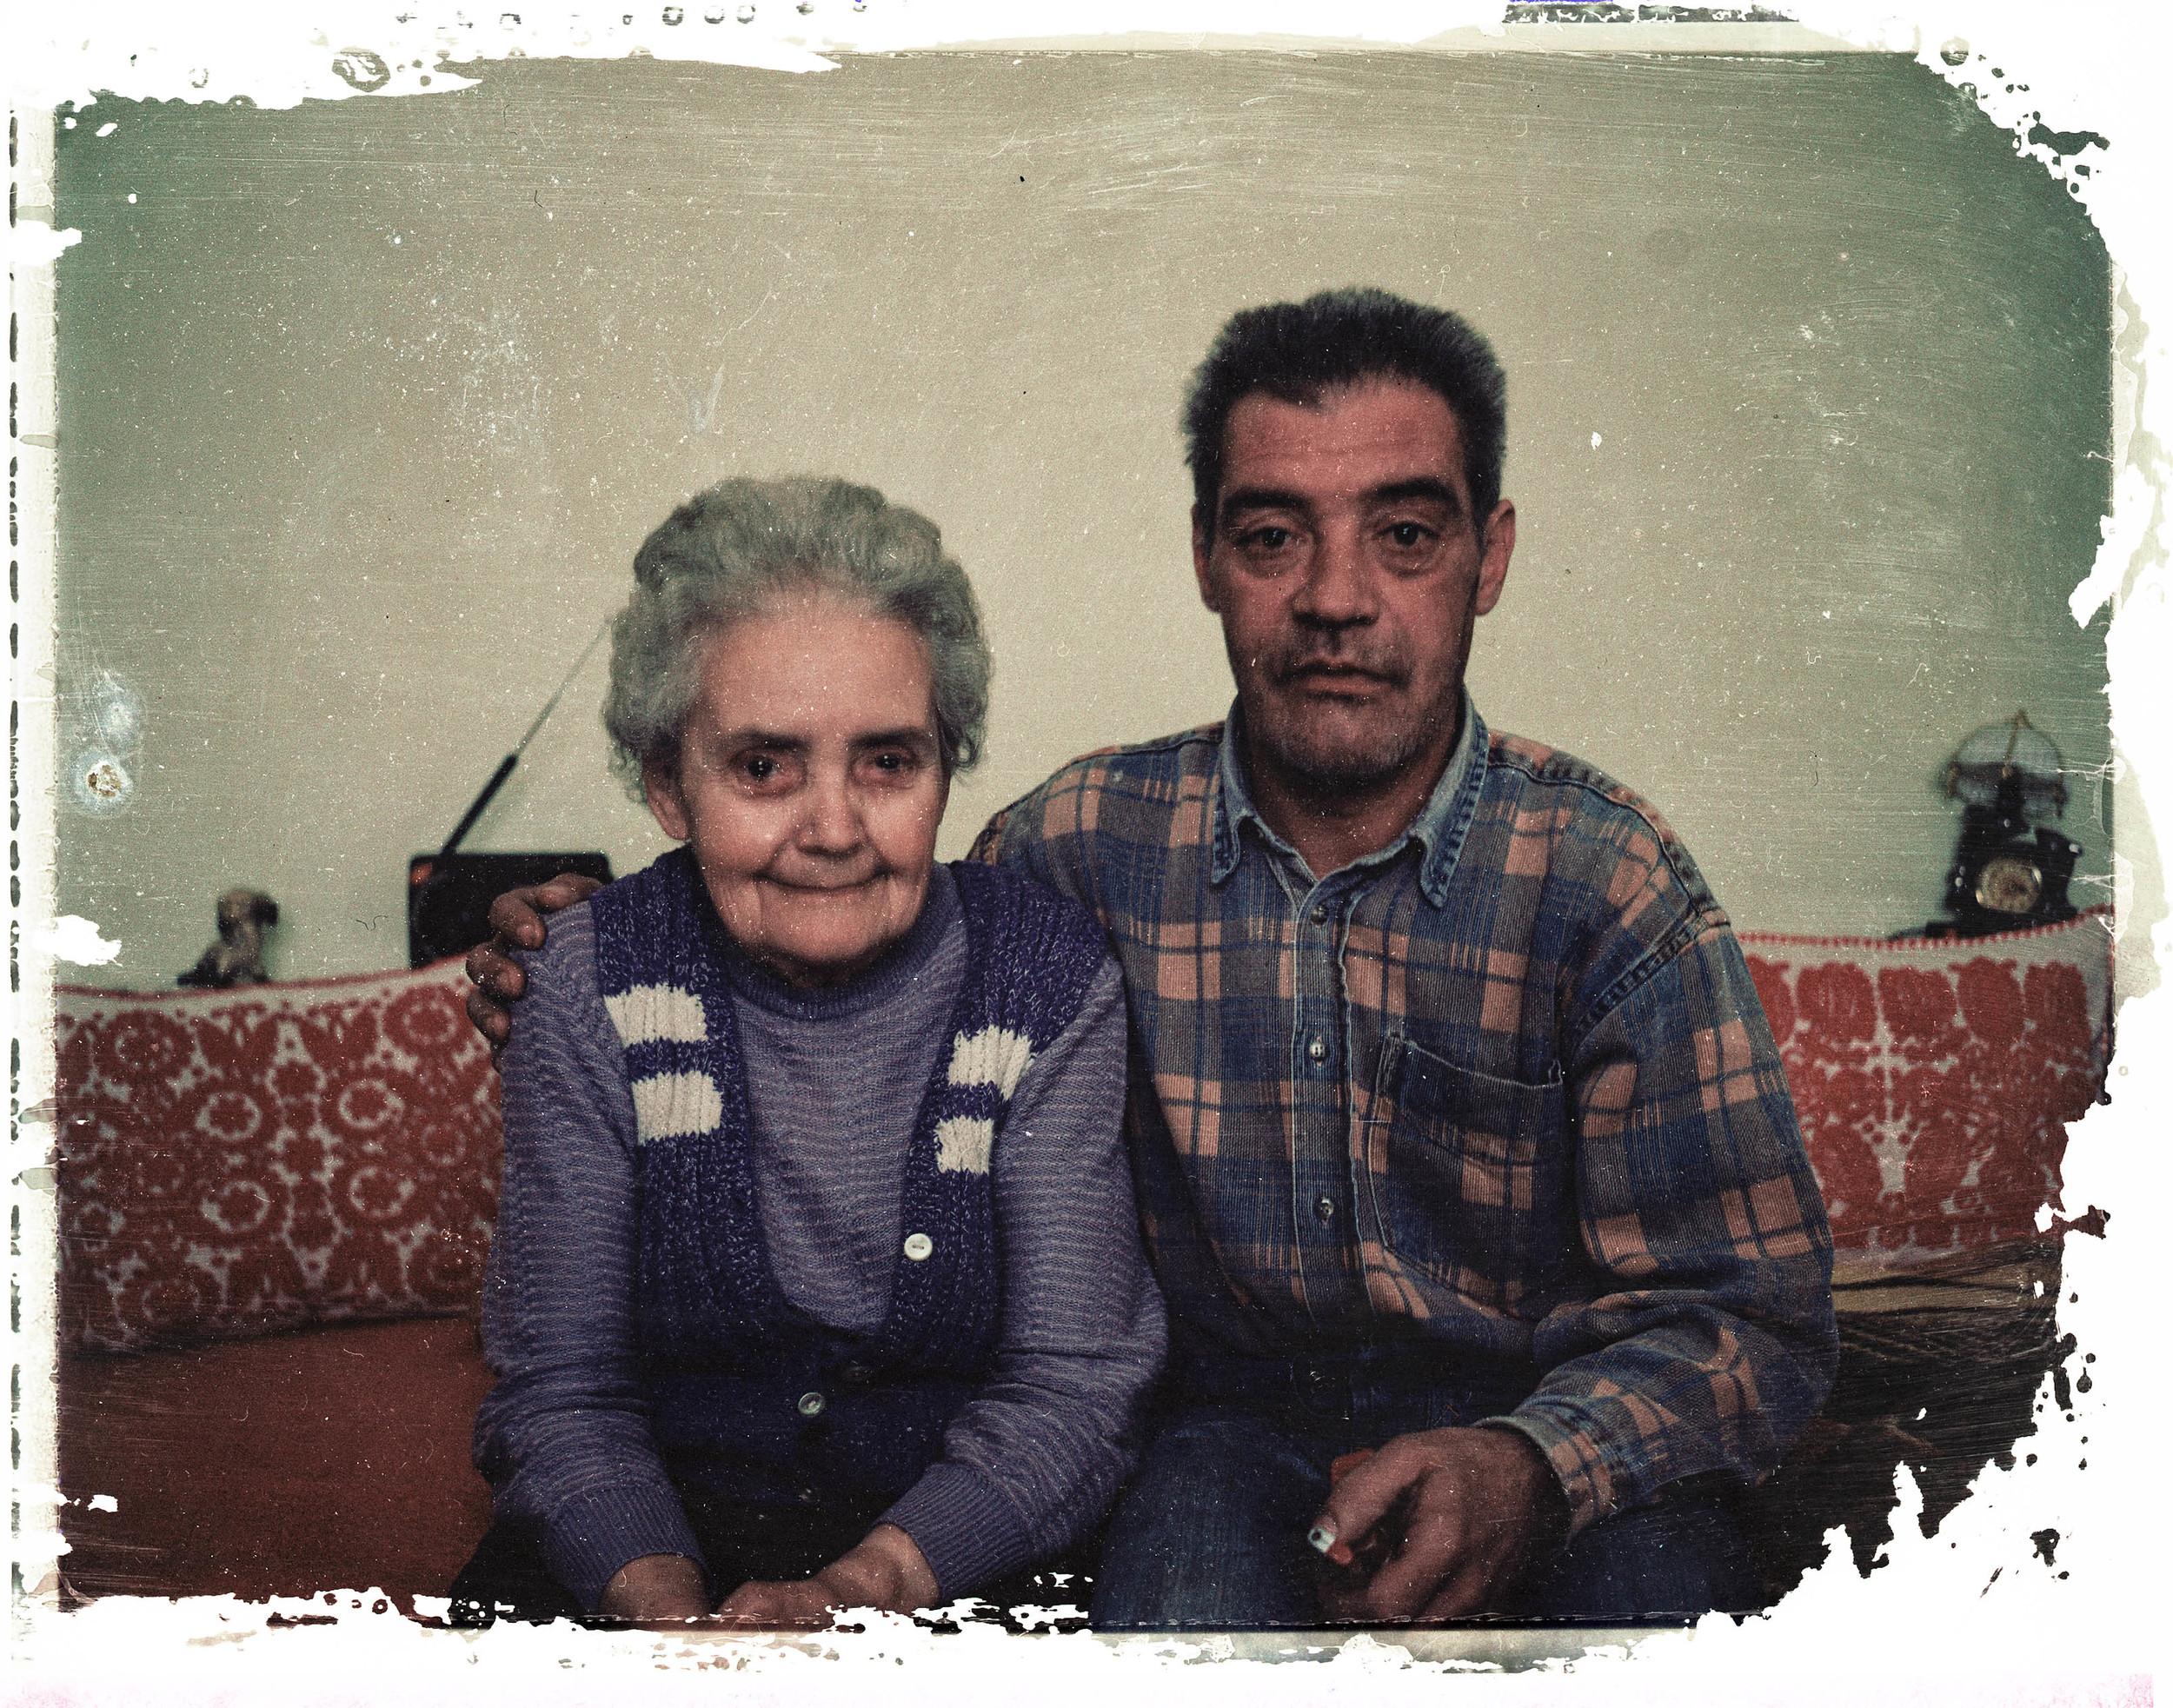 Auntie Sárika with her son. Marosvásárhely, Romania, 2009